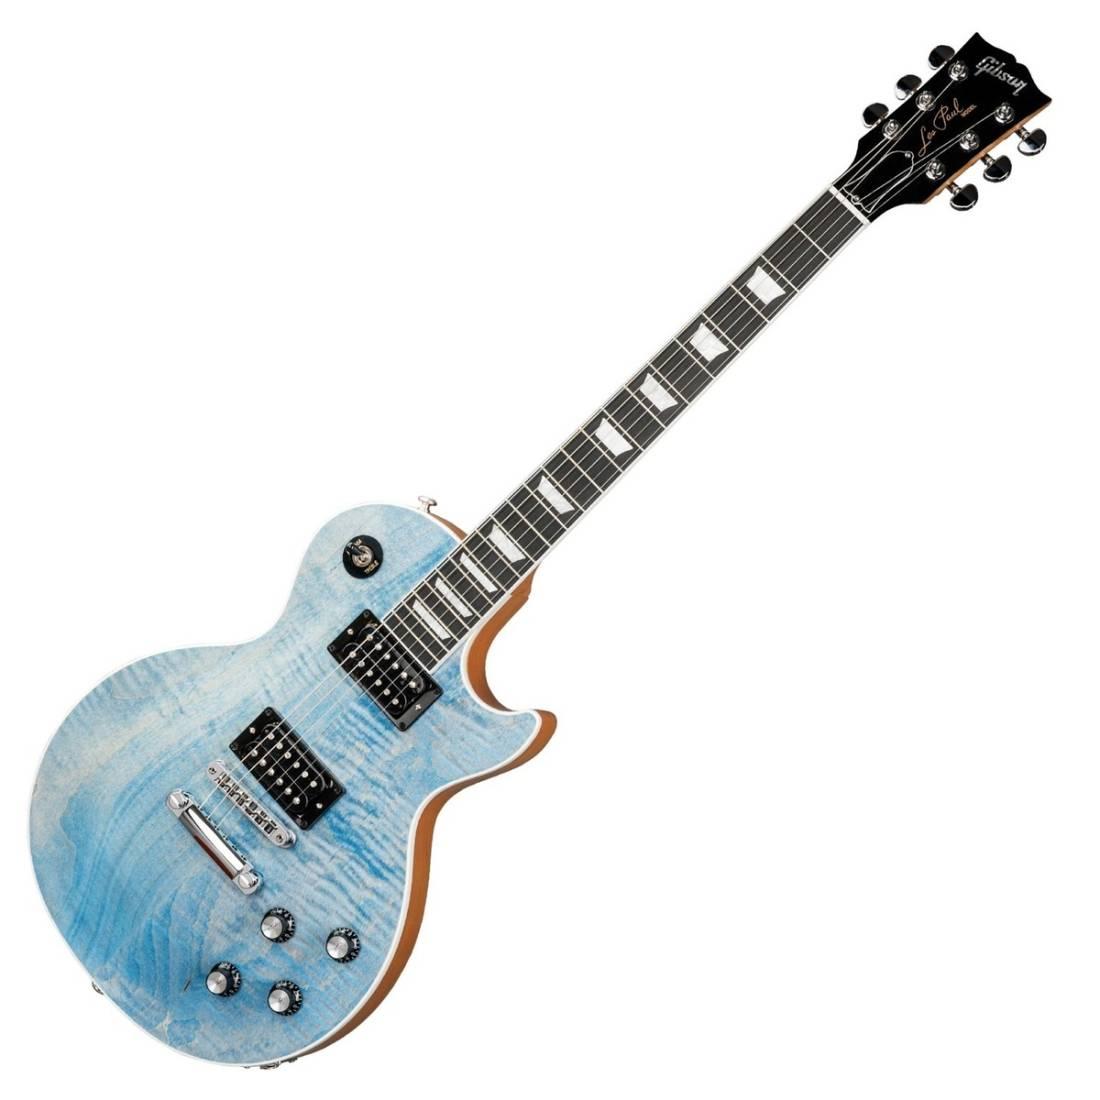 gibson 2018 les paul signature player plus satin ocean blue long mcquade musical instruments. Black Bedroom Furniture Sets. Home Design Ideas